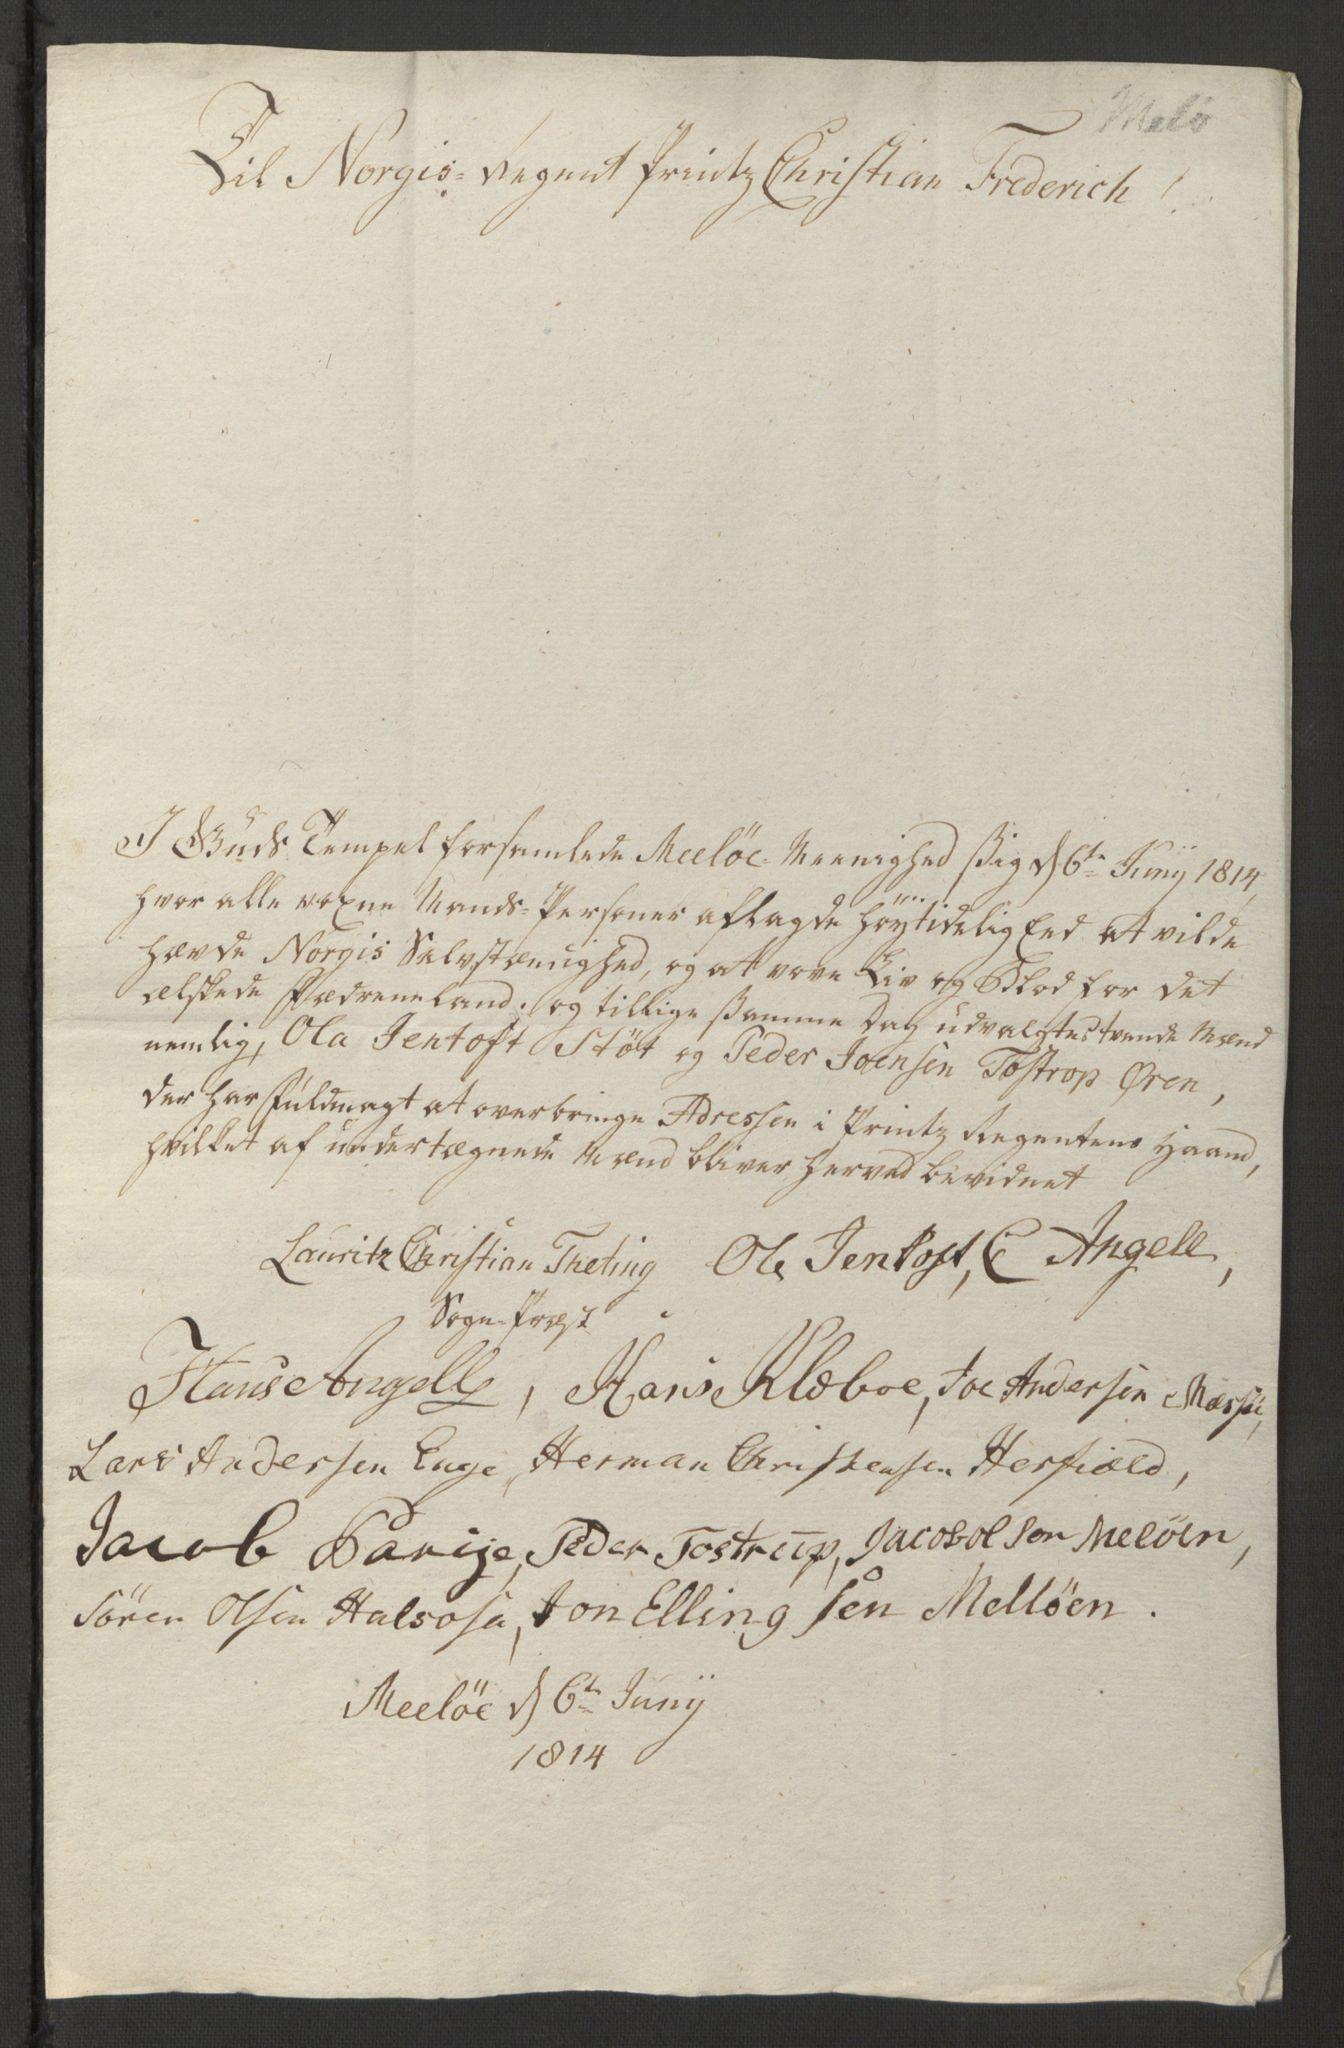 SAT, Nordland amt/fylke*, 1814, s. 40